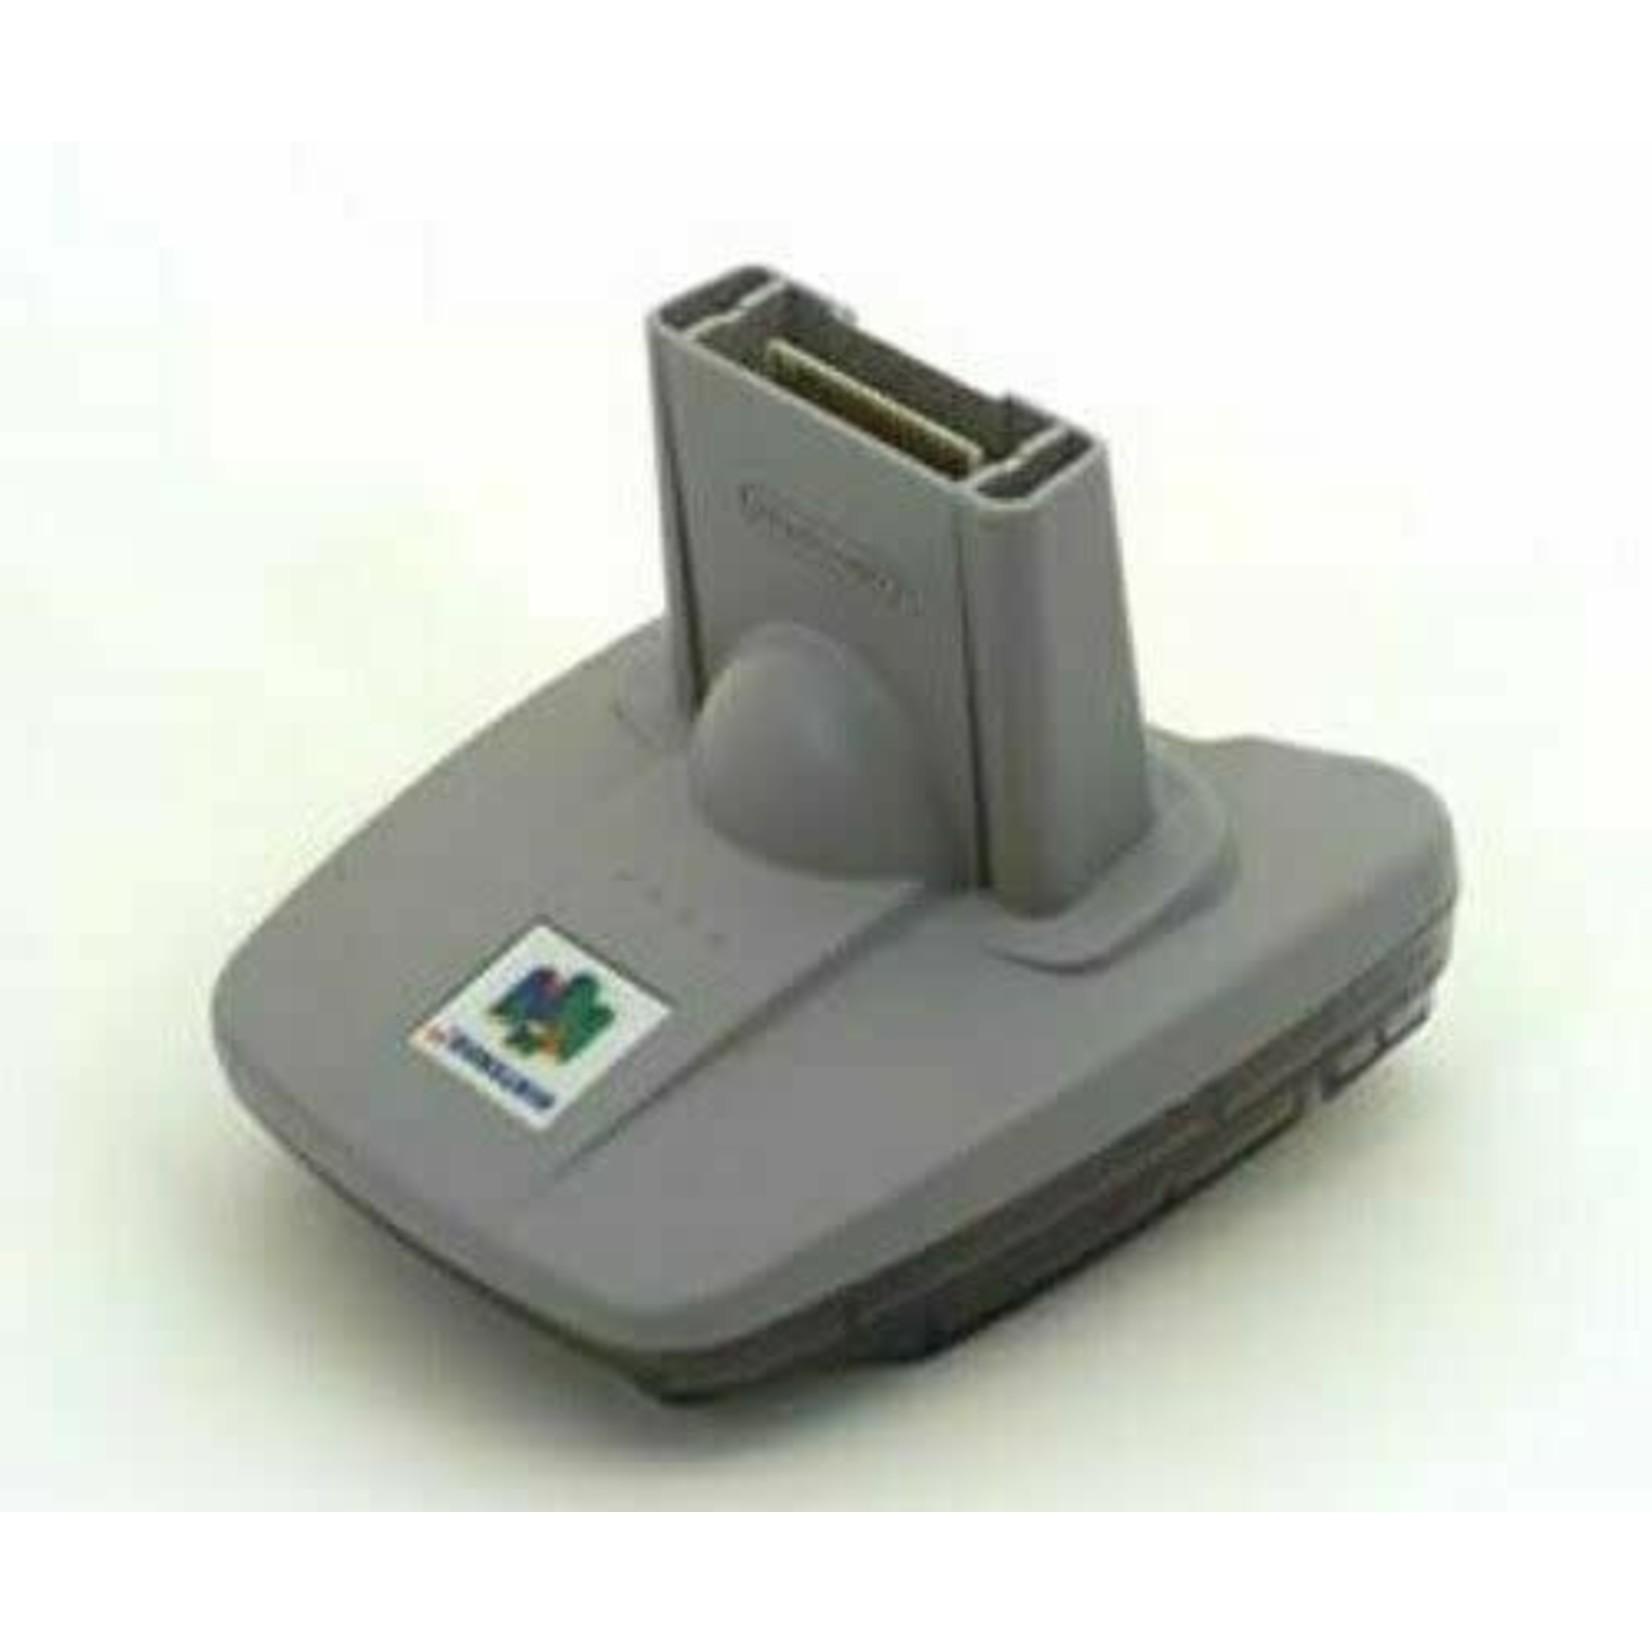 N64U-GAMEBOY TRANSFER PAK